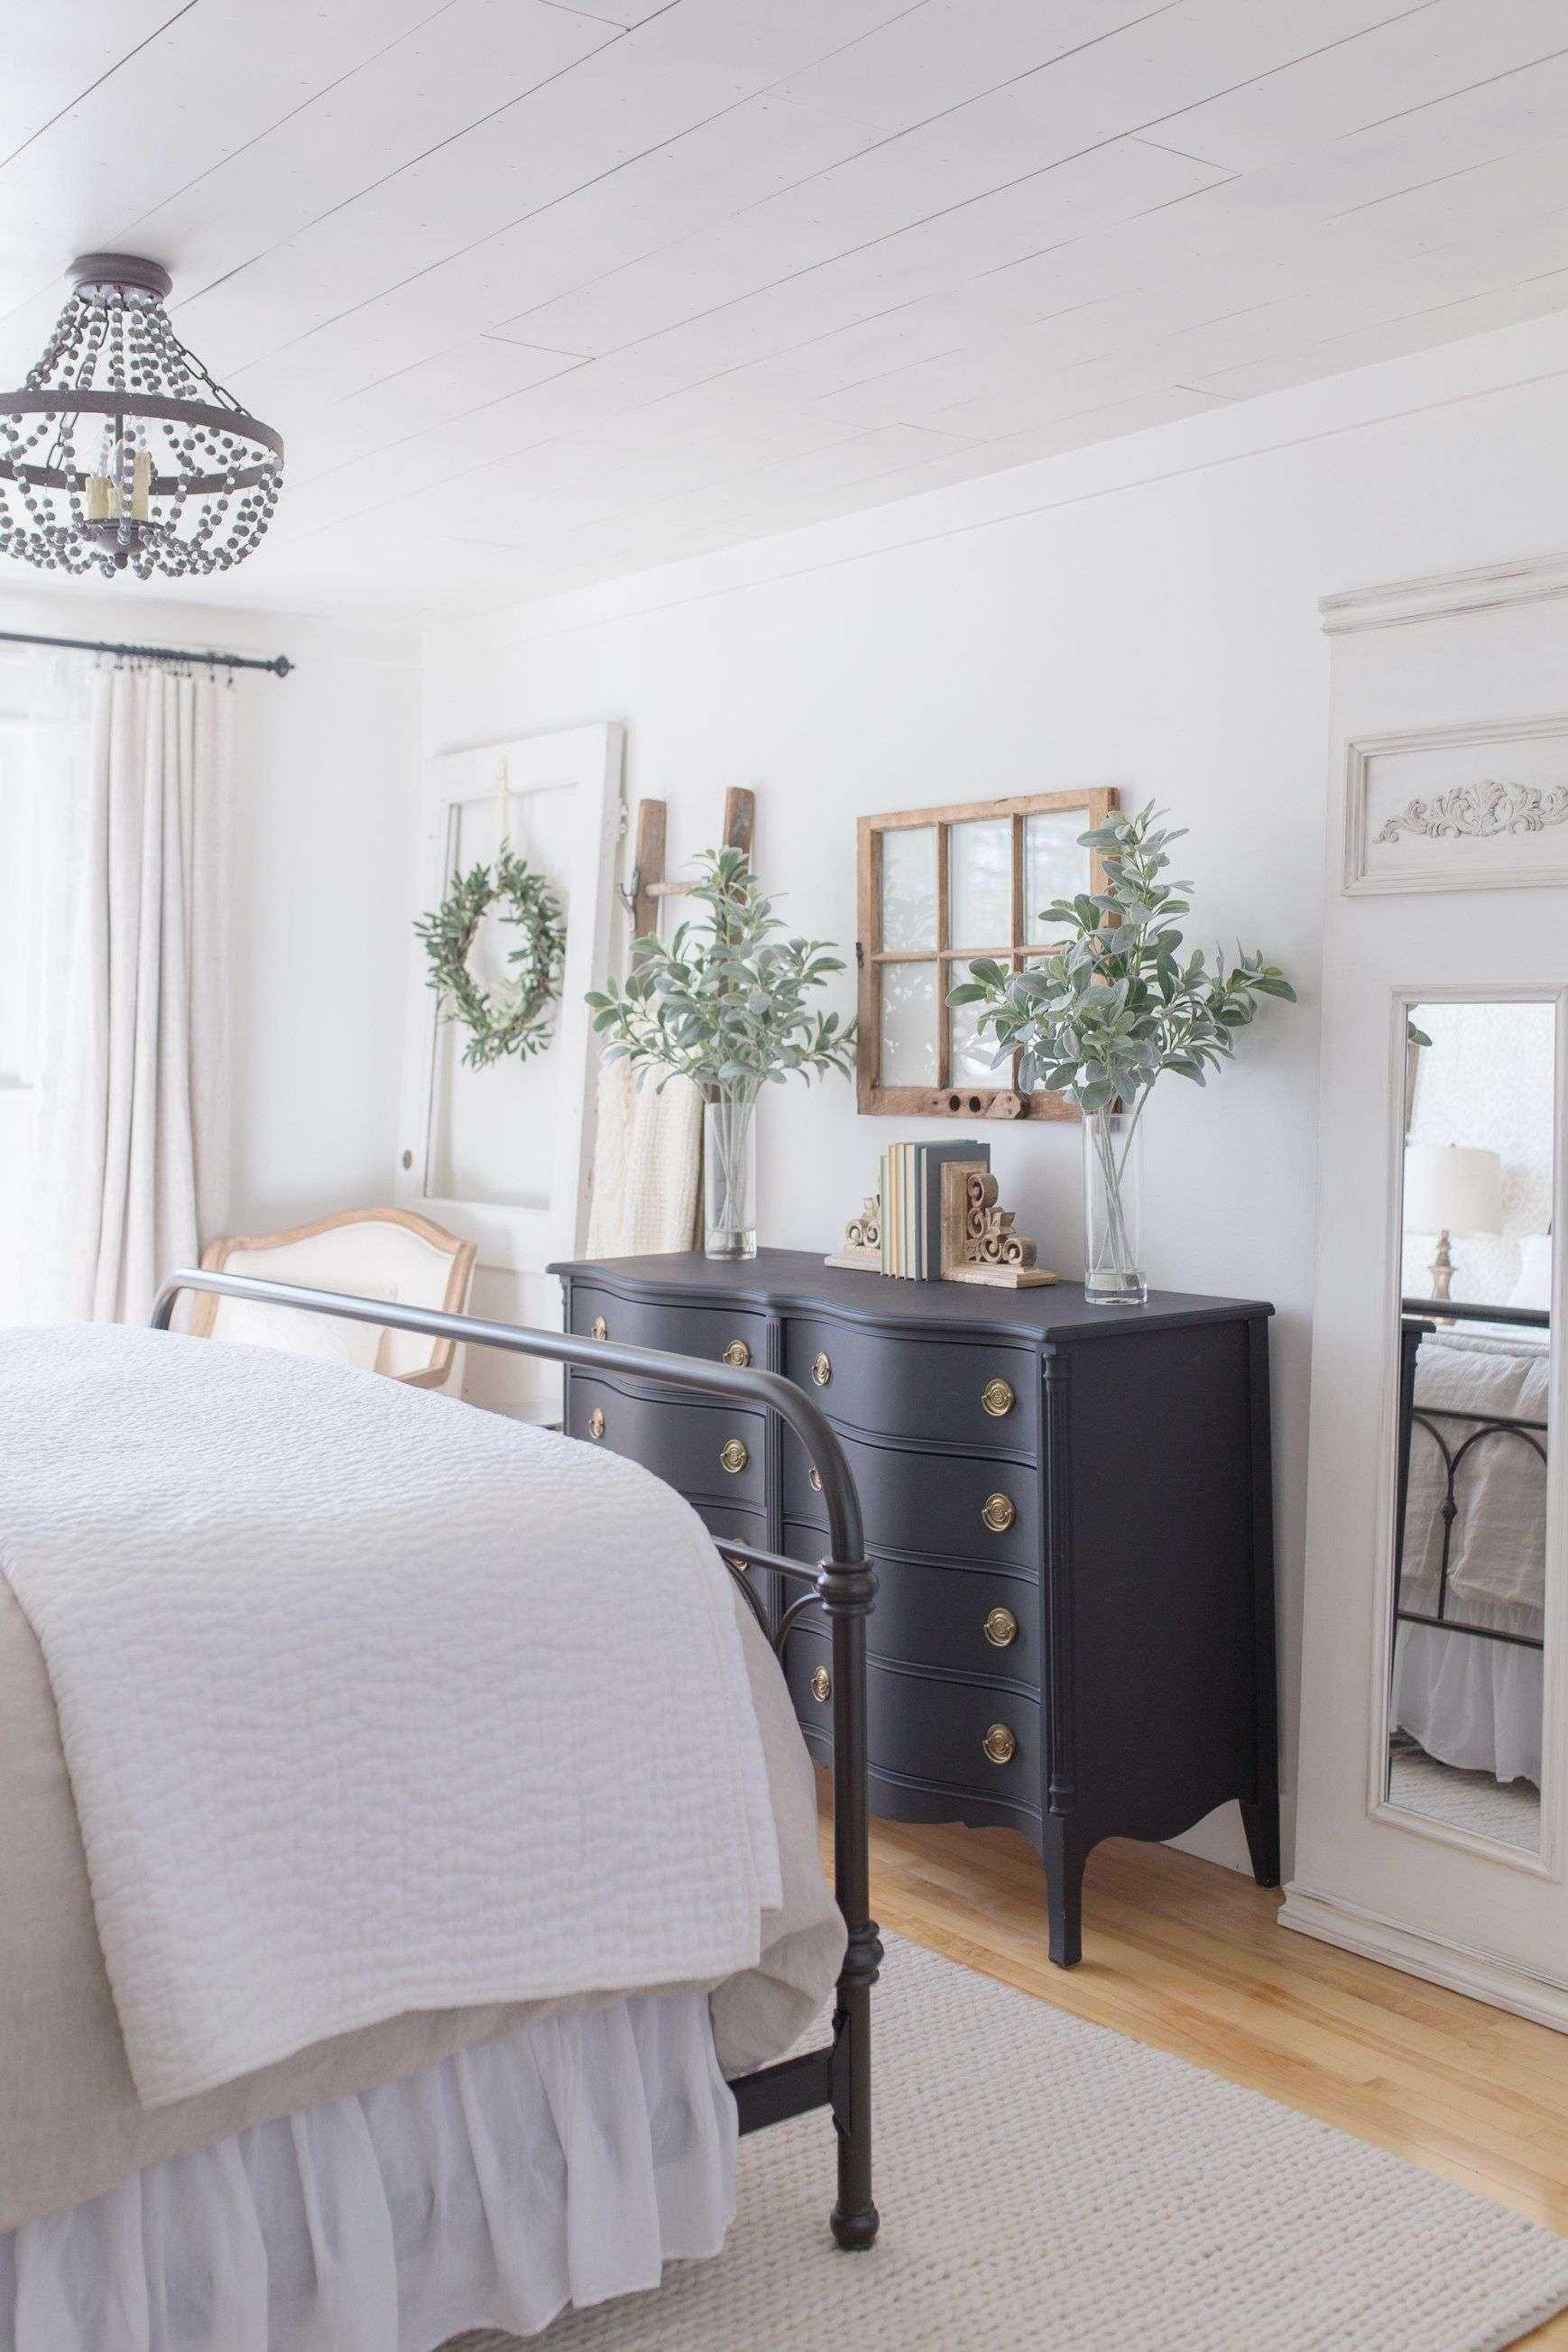 Joanna gaines rustic farmhouse bedroom elegant - Rustic elegant bedroom furniture ...